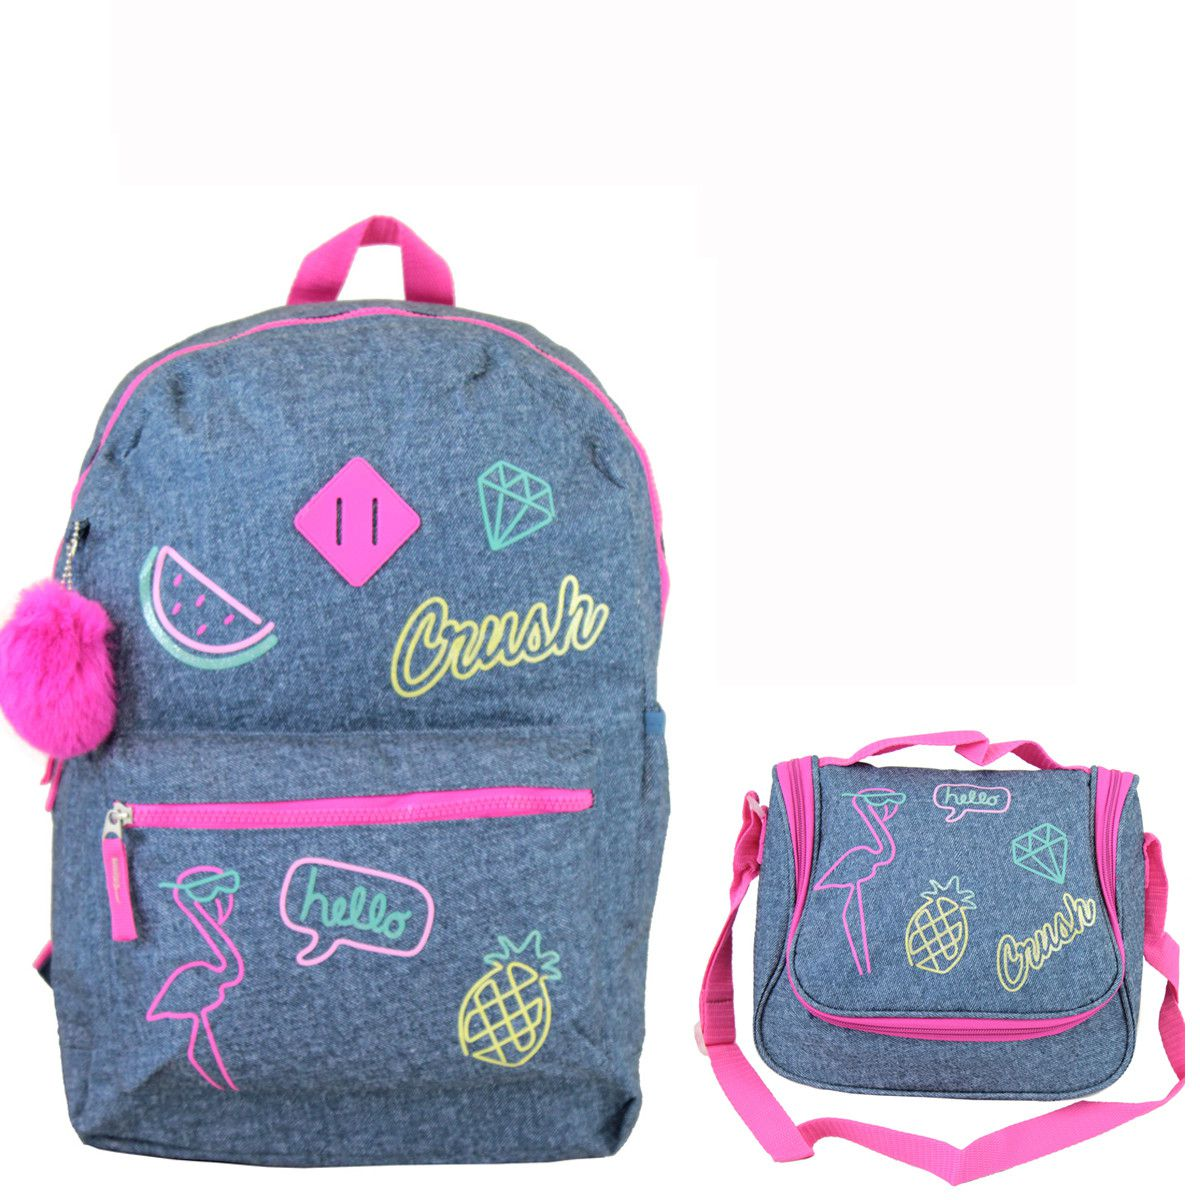 Kit Escolar Juvenil Cruch Mochila Lancheira Menina Flamingo Clio